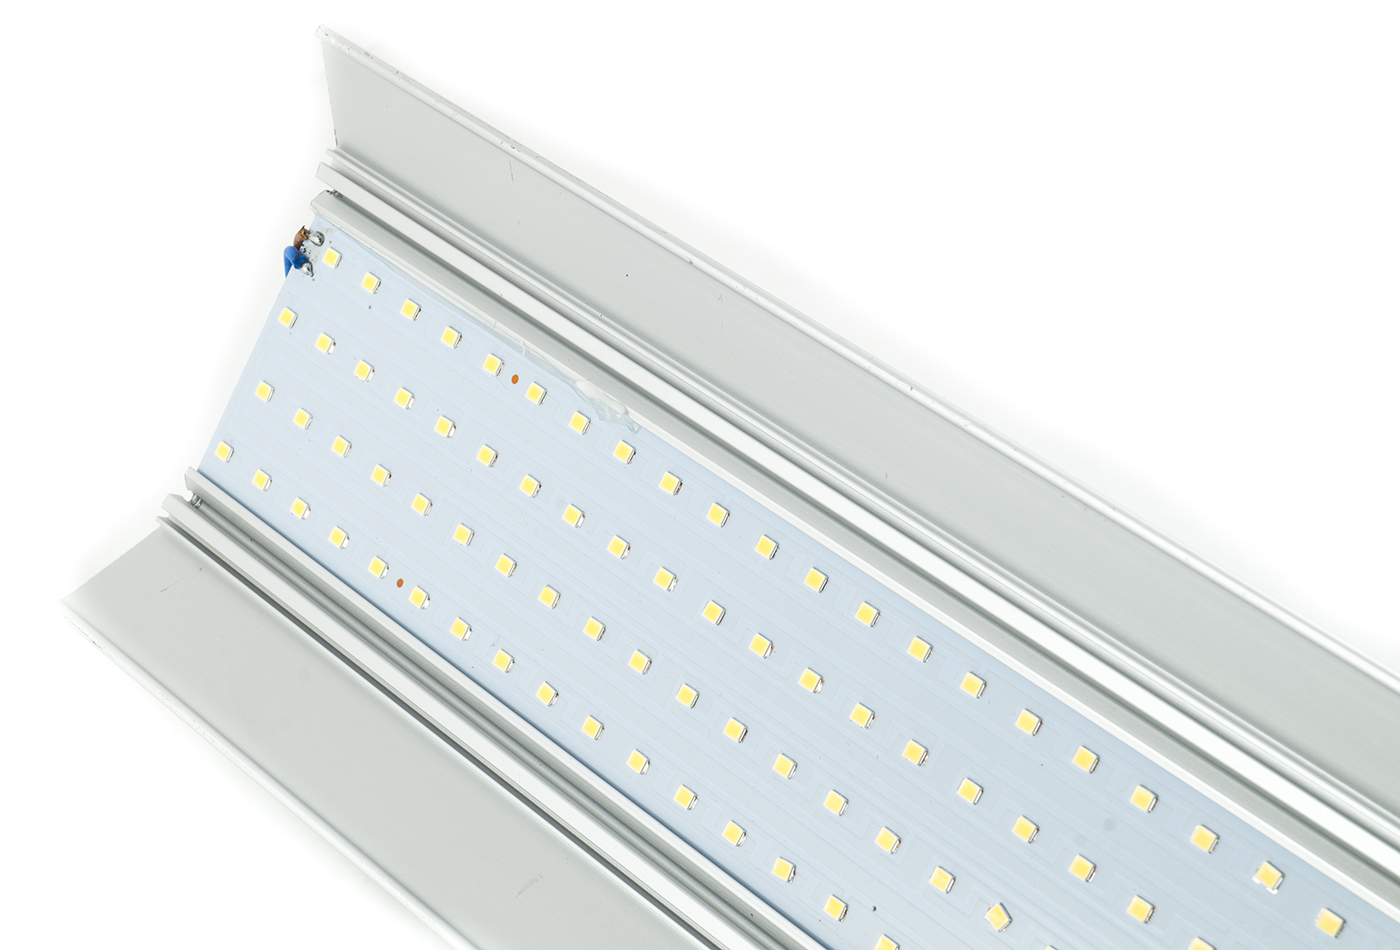 Plafoniera Led 120 Cm Prezzo : Bes plafoniere beselettronica plafoniera lampada